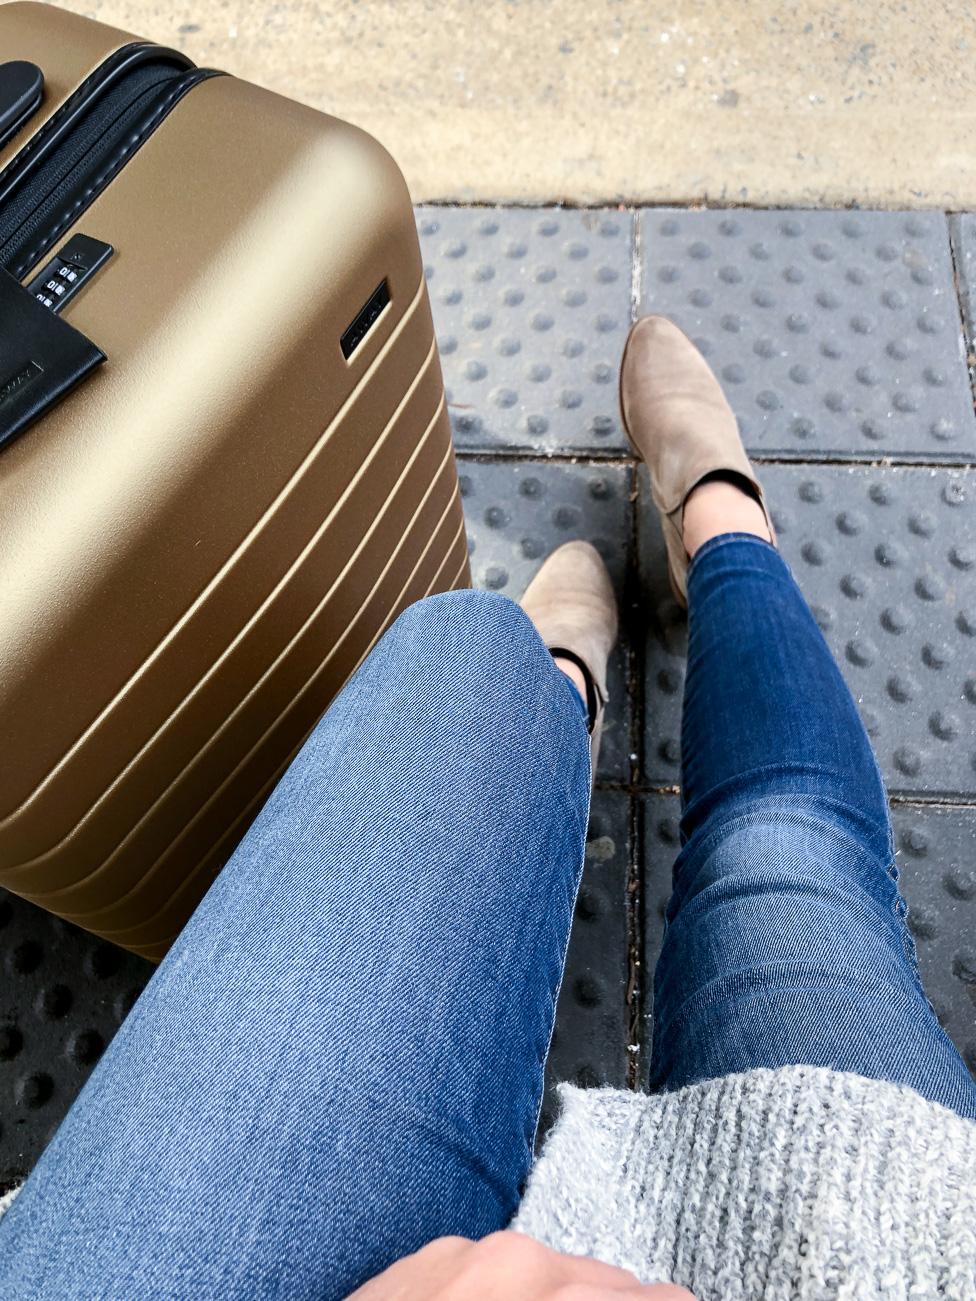 2017 Travel Recap: 6 Countries + 16 Cities